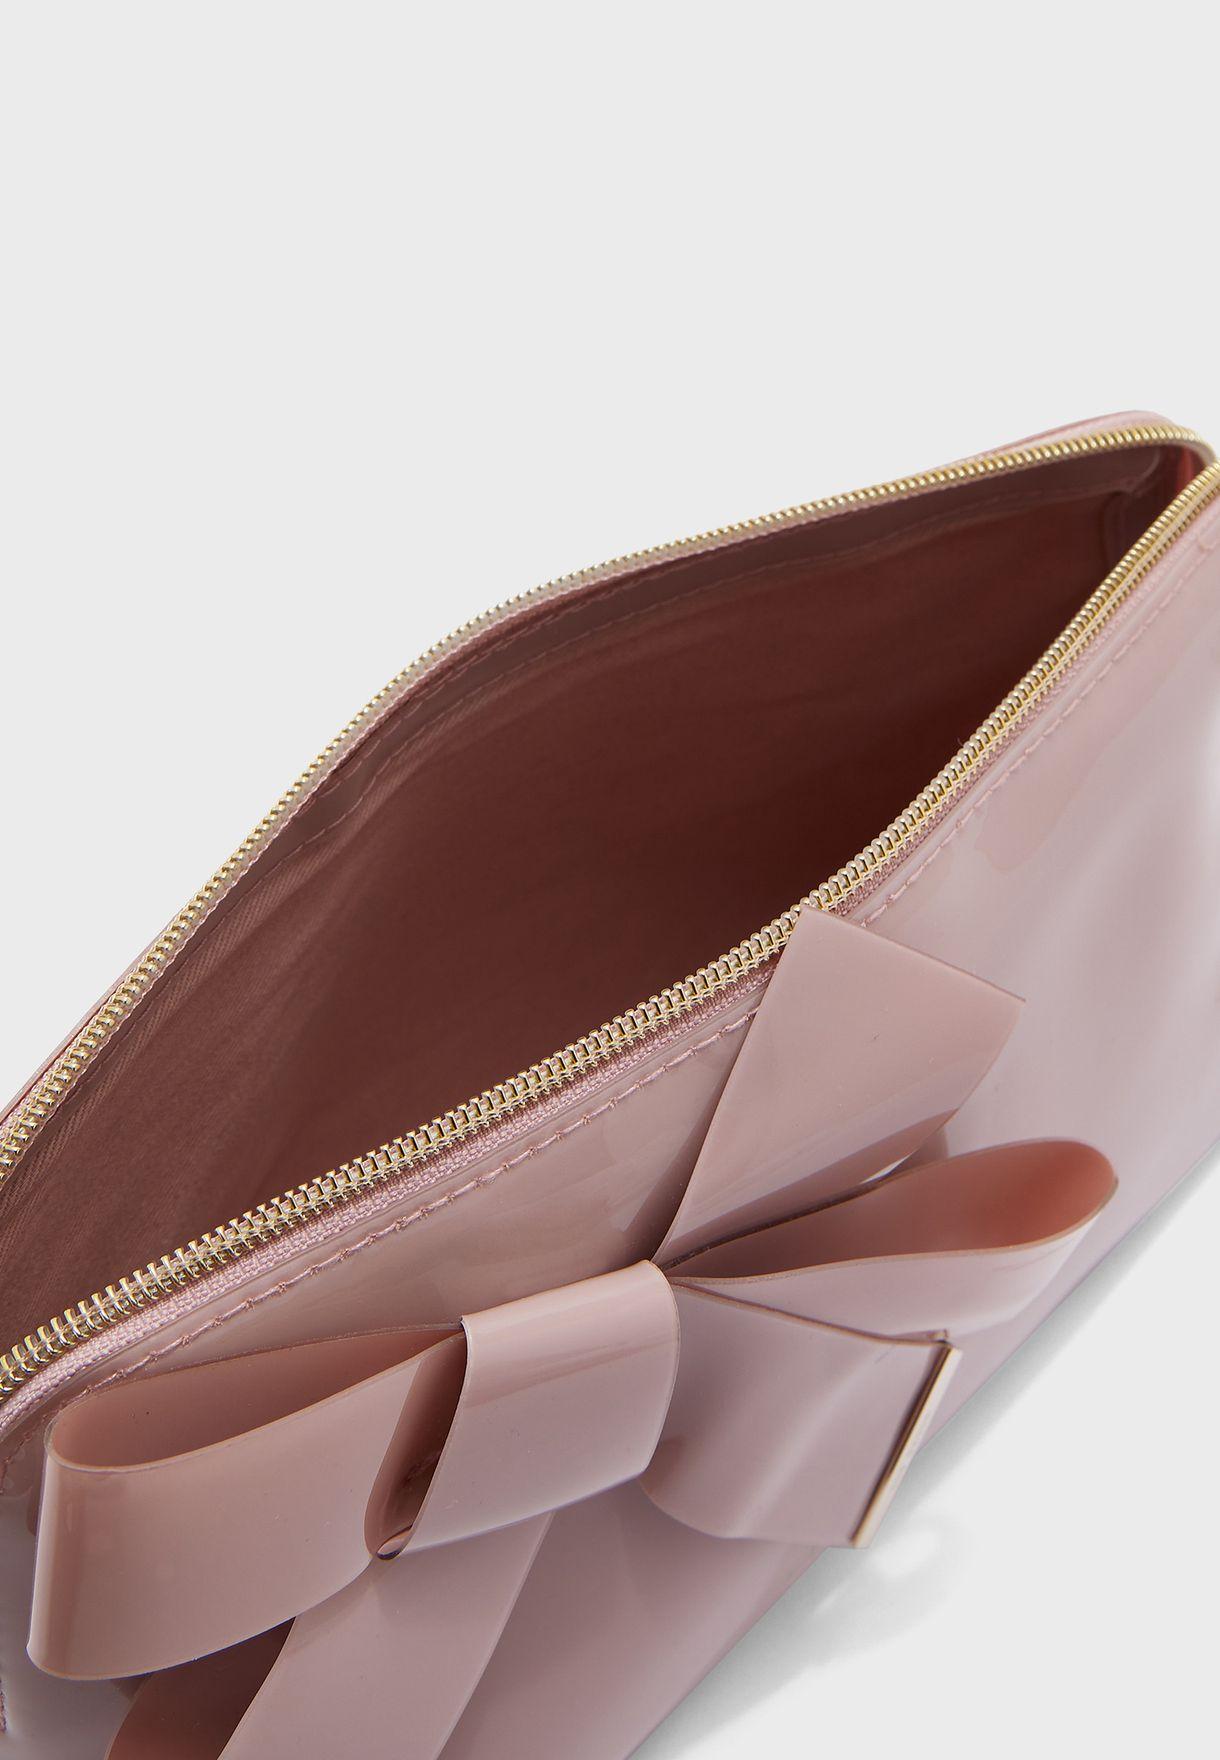 Nicco Cosmetic Bag